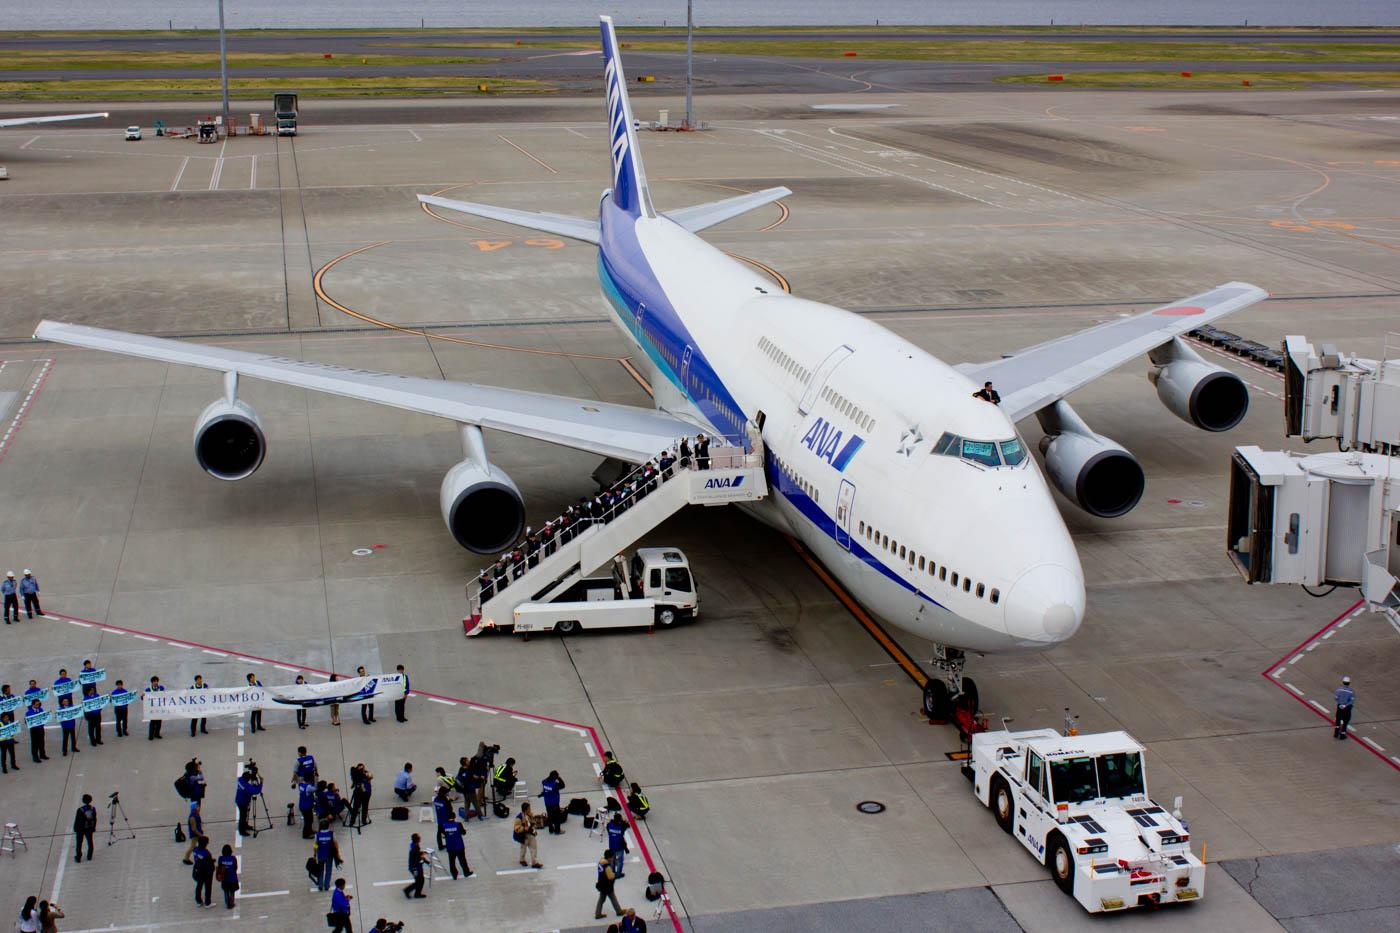 ANA Boeing 747-400 Retirement